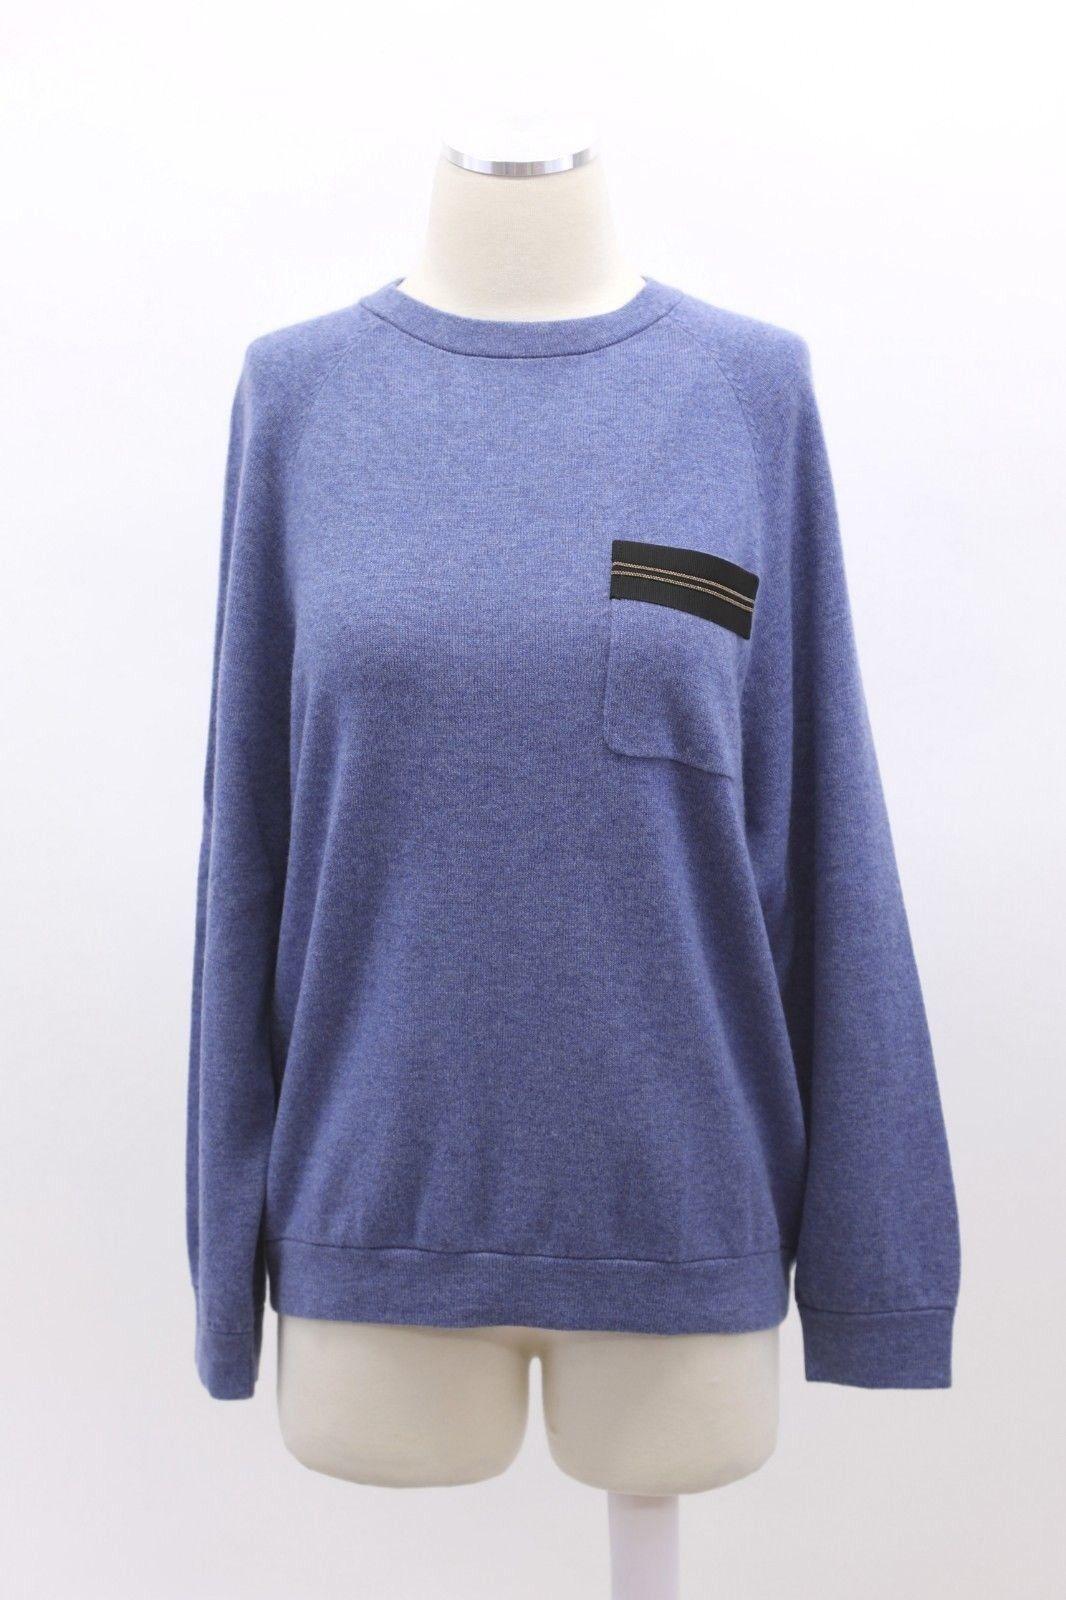 NWT  Brunello Cucinelli Women's 100% Cashmere Monili Bead Trim Sweater A186